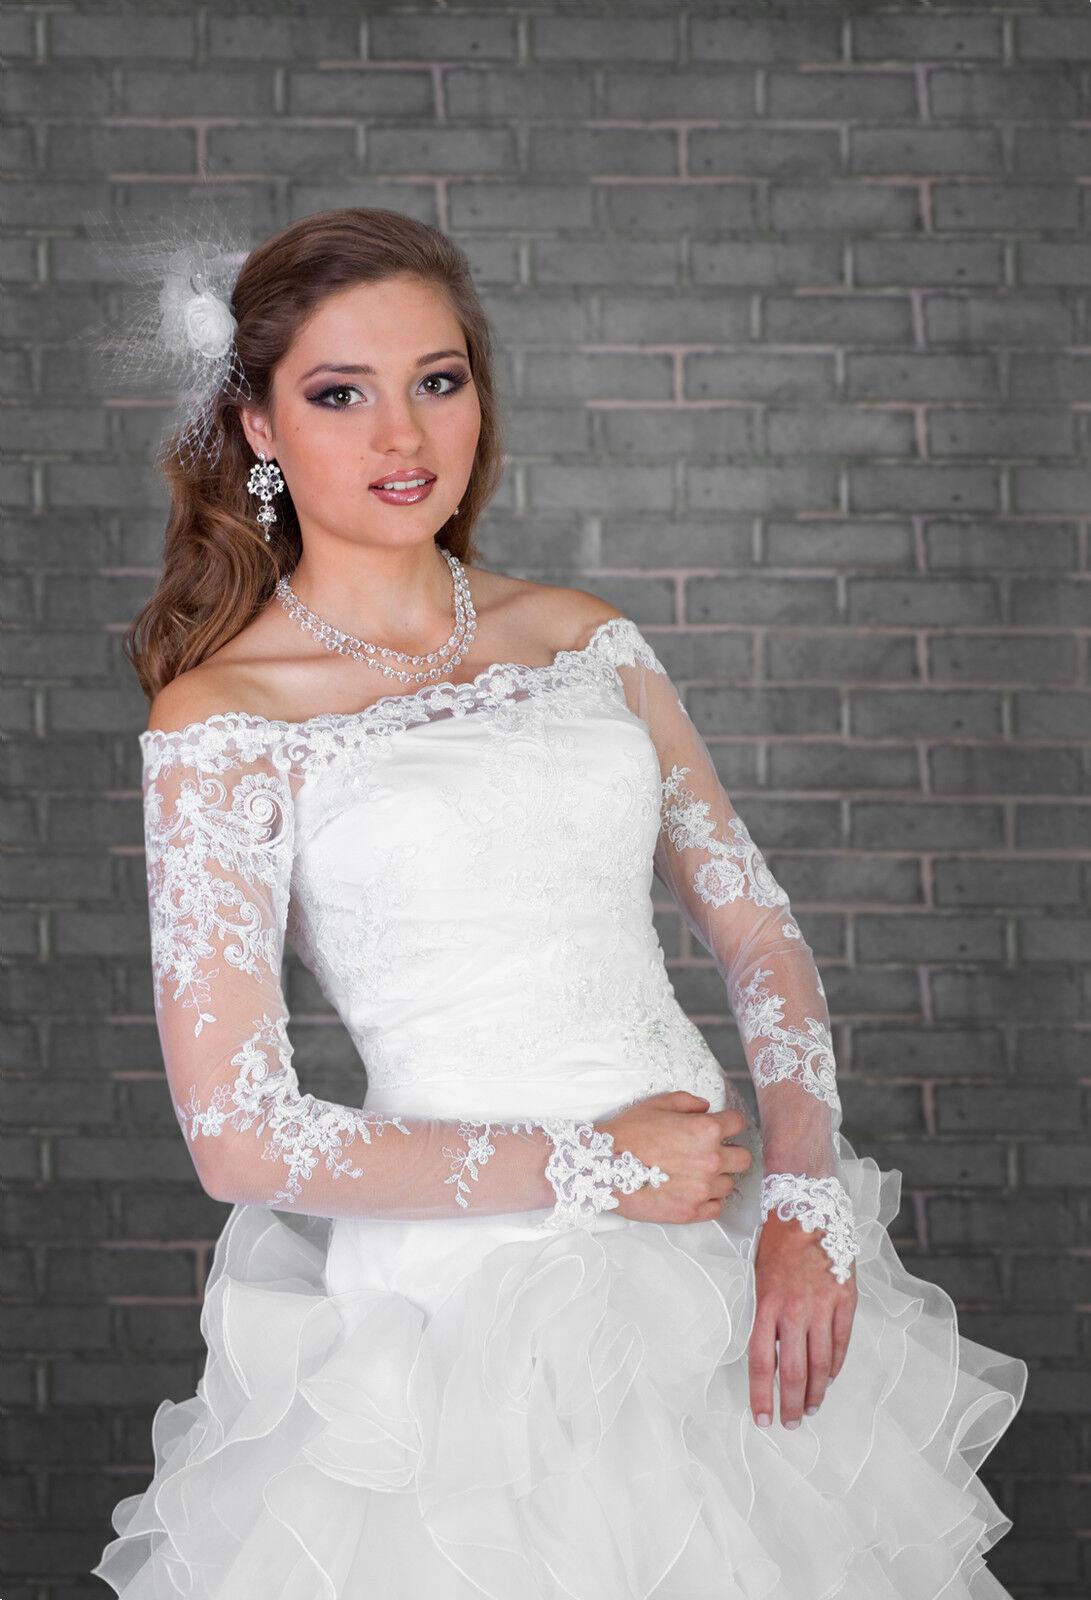 75d757ce30cdb New Luxury Womens Bridal Lace Bolero Shrug Wedding Jacket Long Sleeve  S/M-L/XL